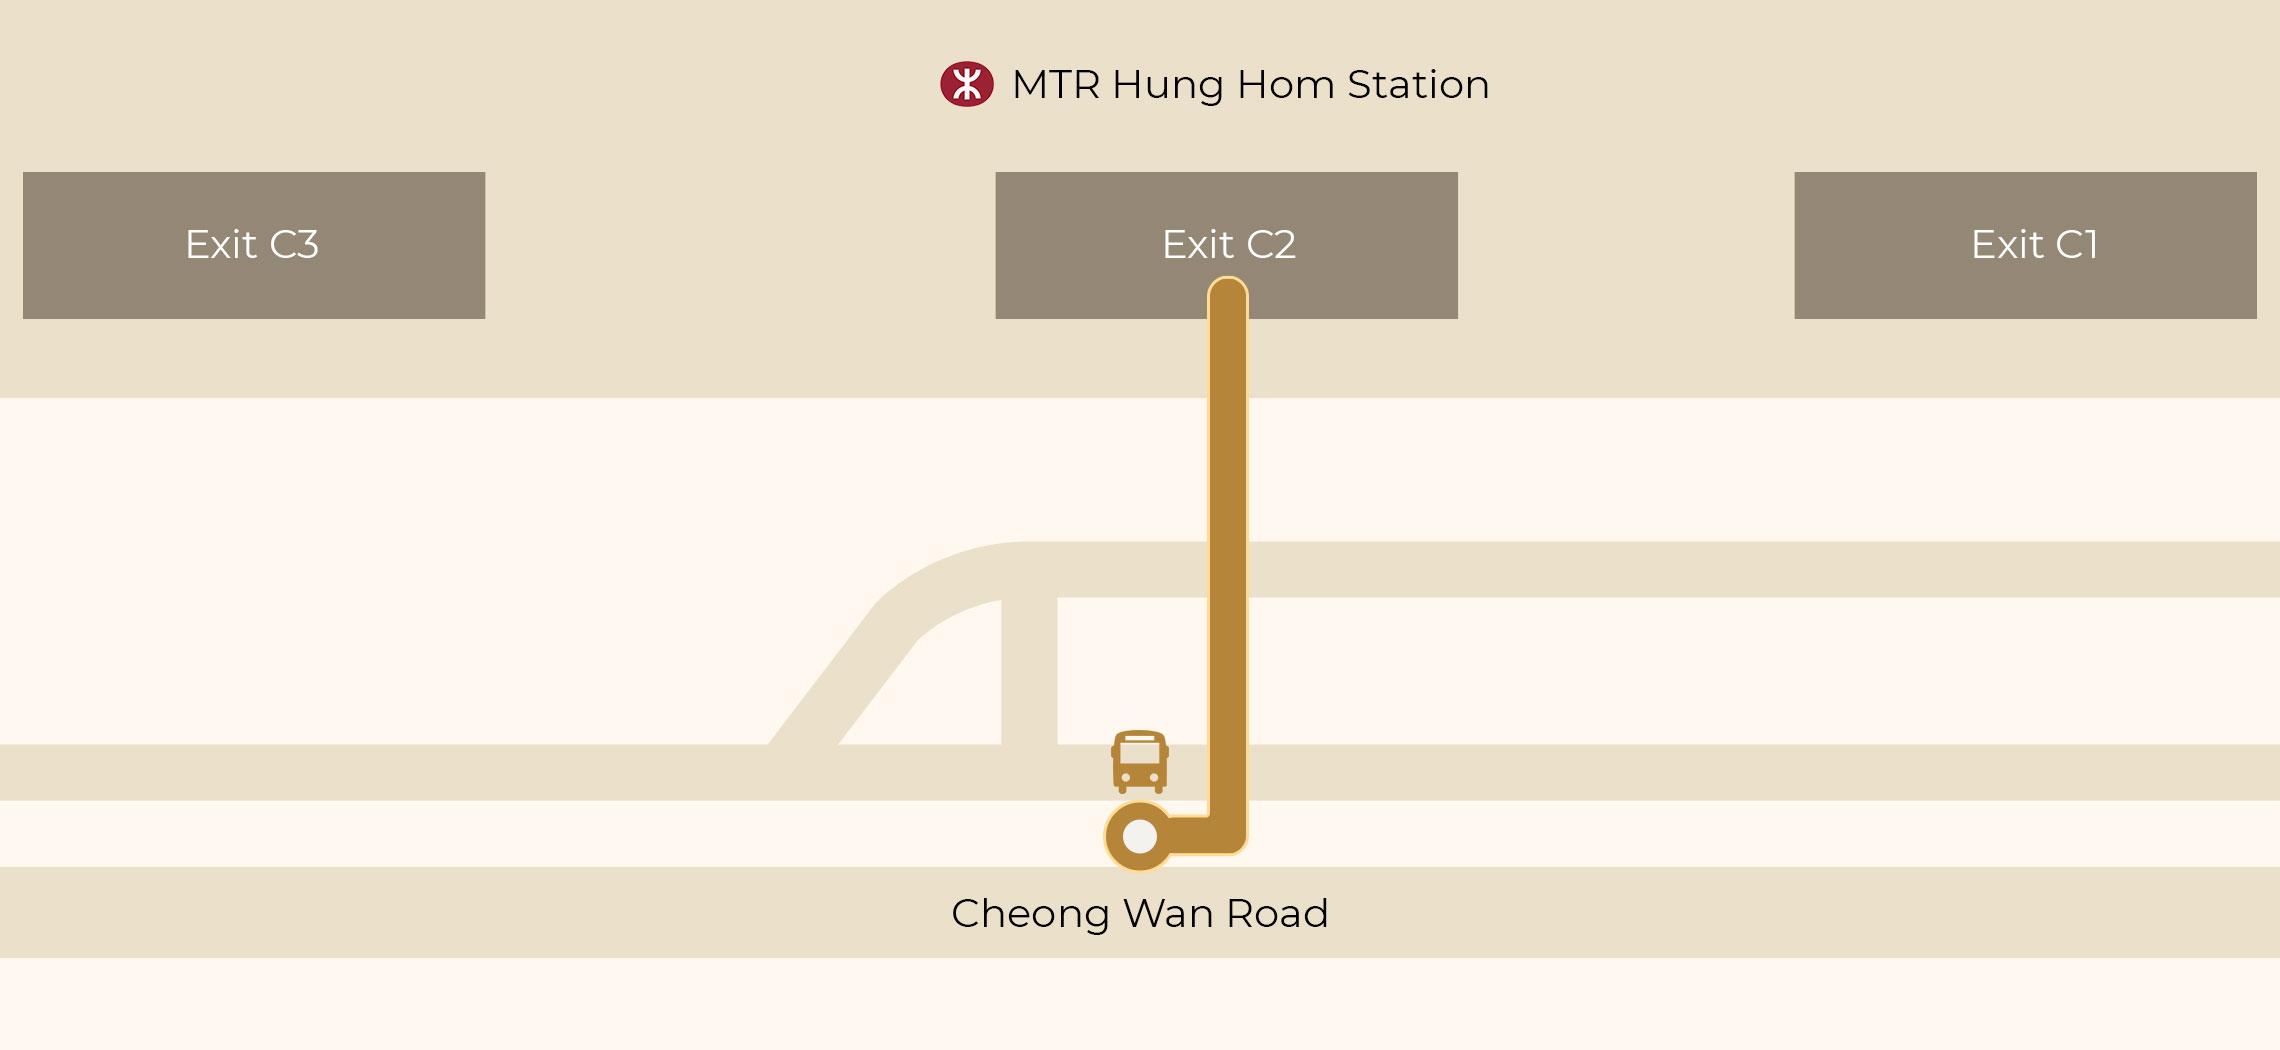 MTR Hung Hom Station